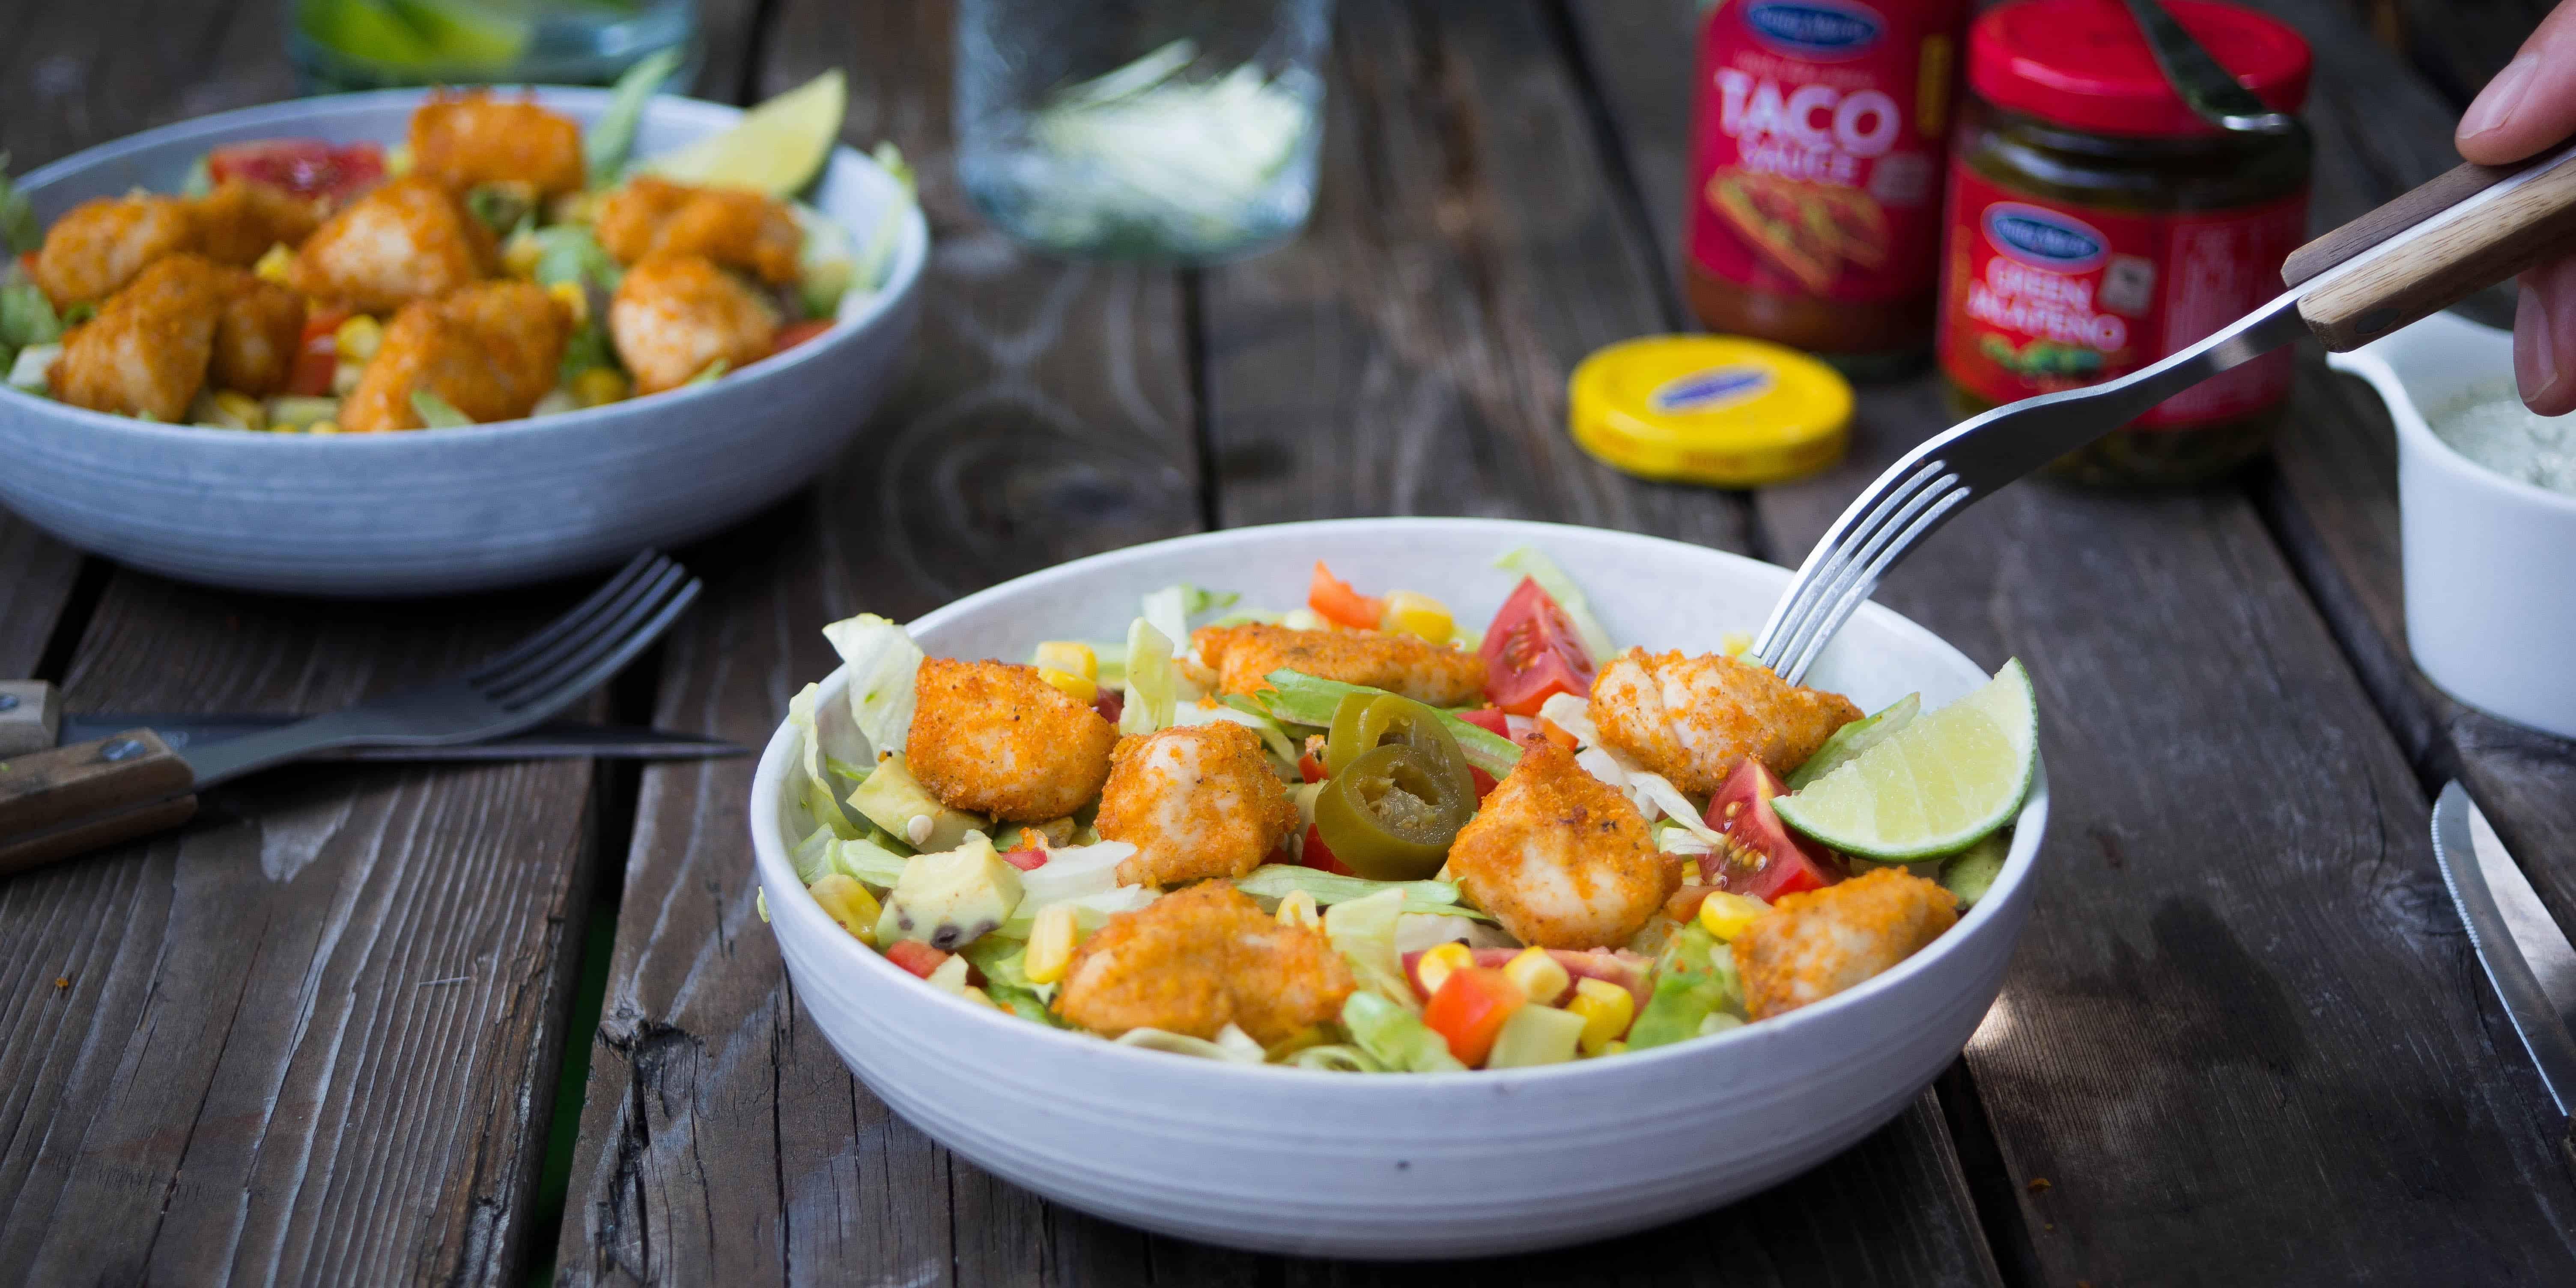 Ongekend Zomerse salade met krokante kip - Charlie's Kitchen ZB-52